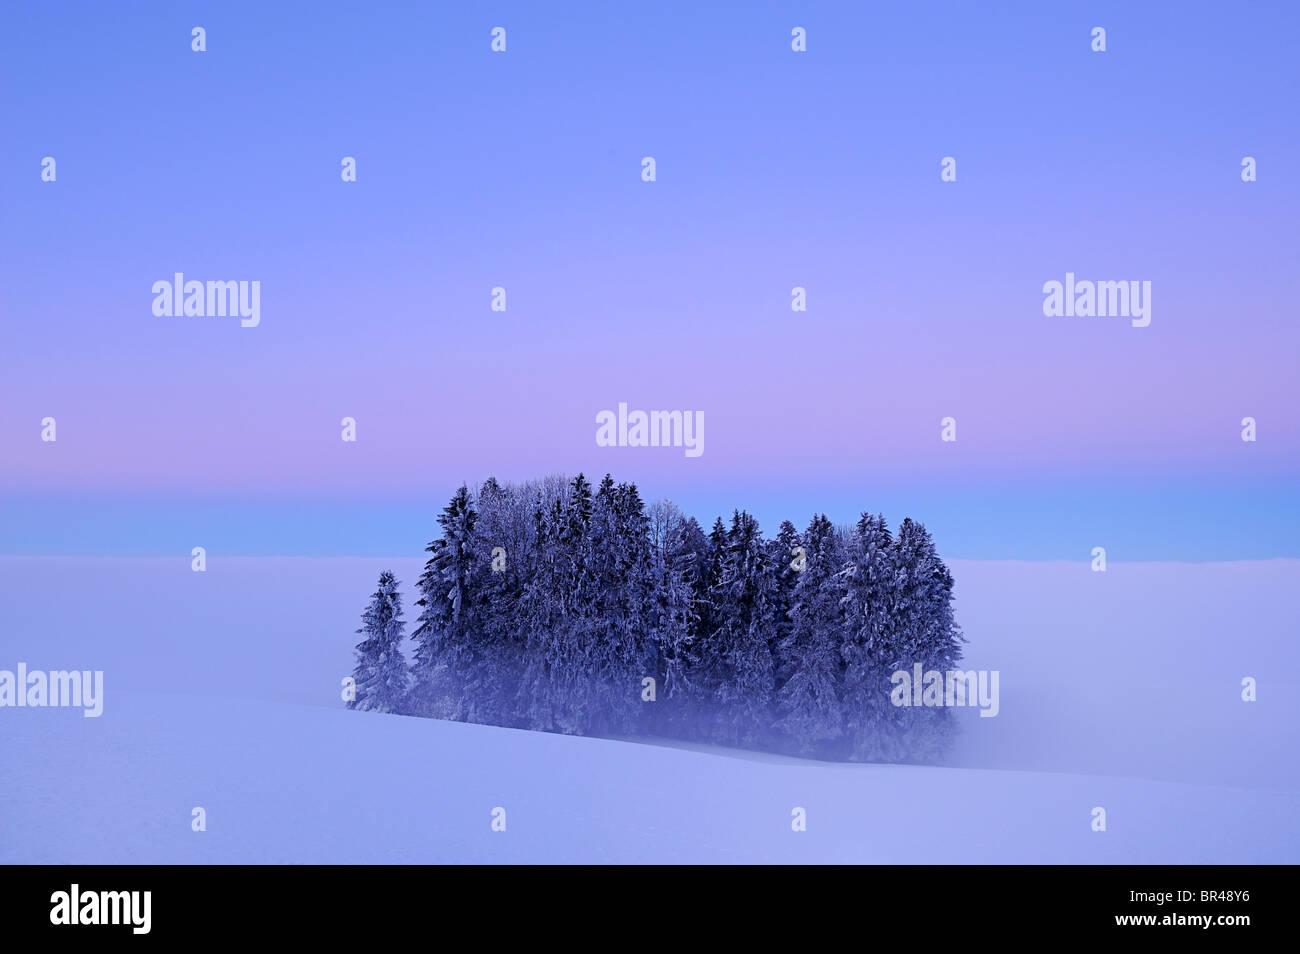 Foresta avvolta nella nebbia, Lindenberg, Argovia, Svizzera, Europa Foto Stock